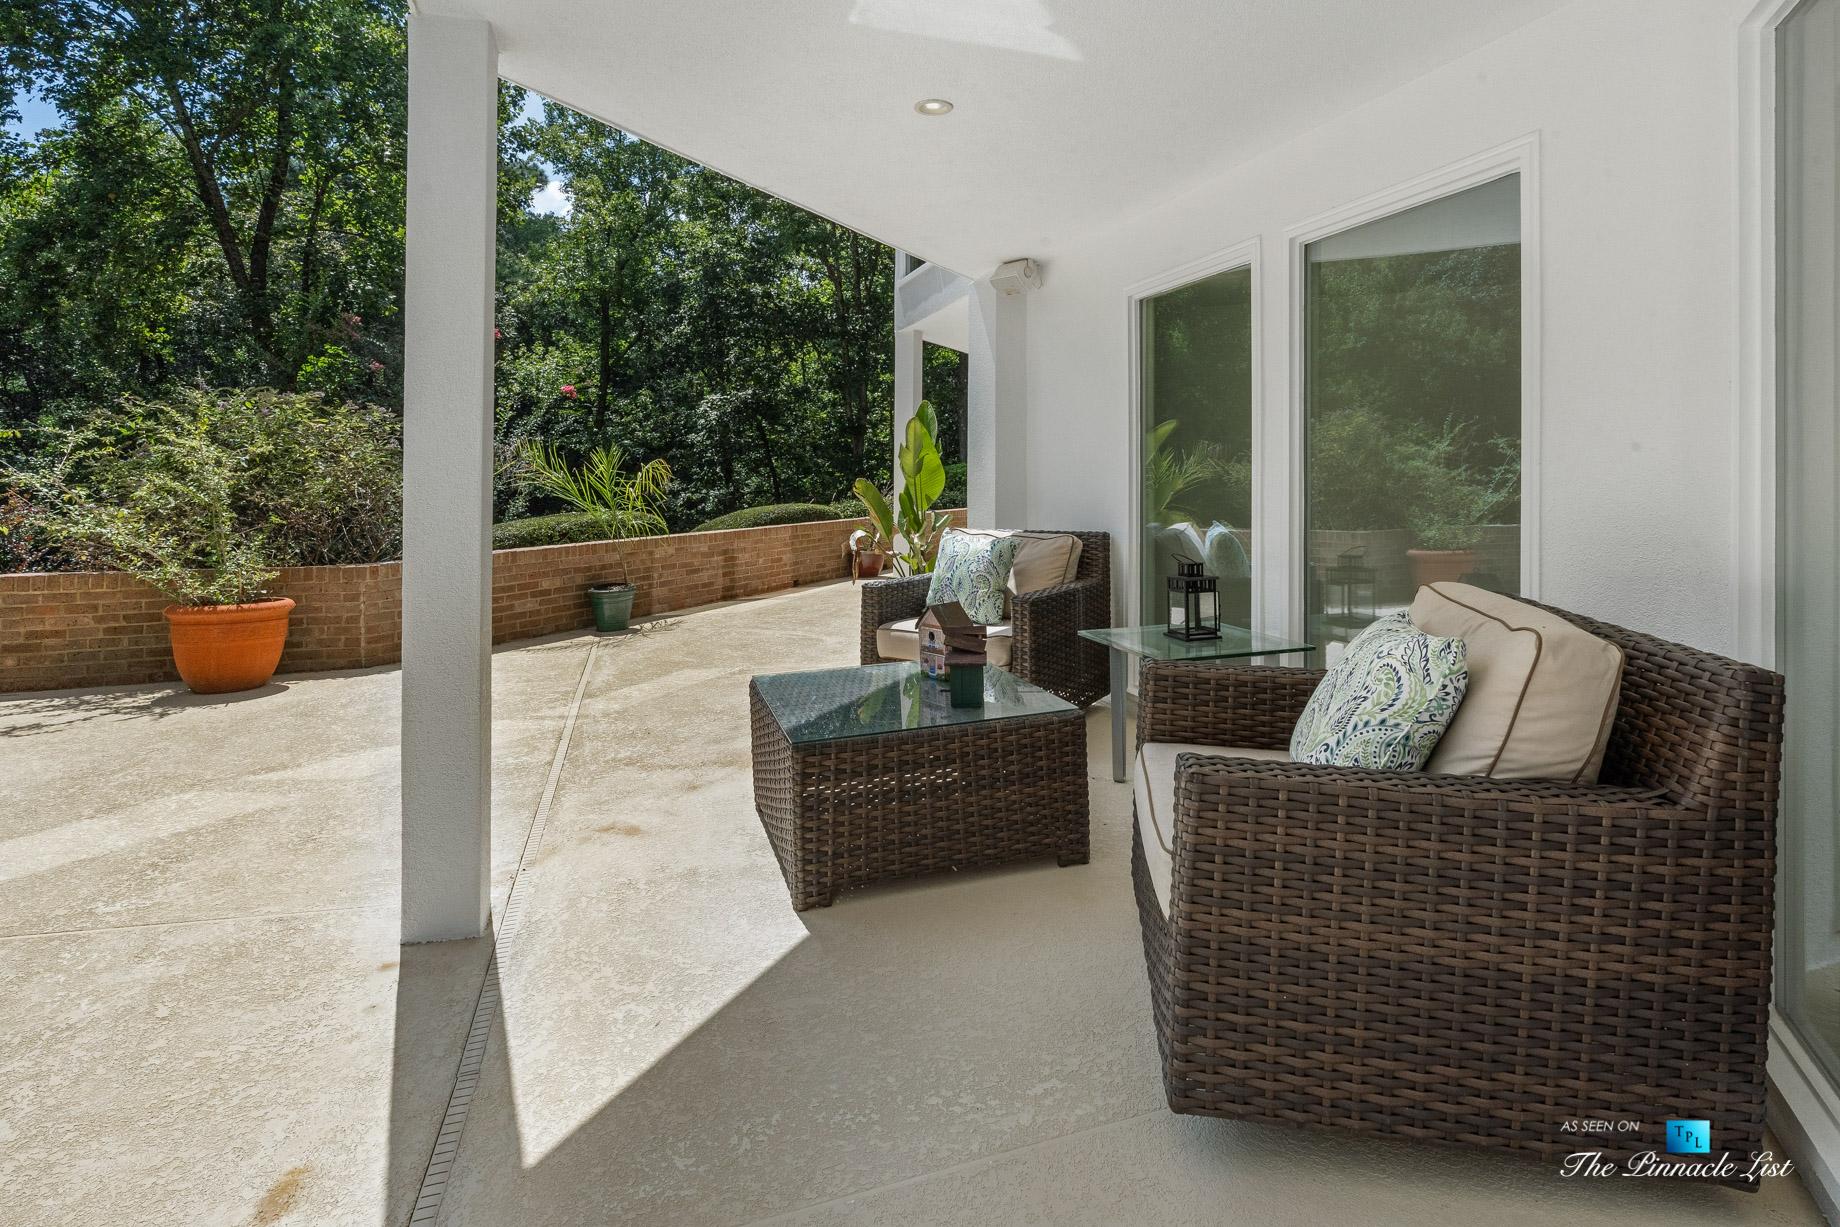 3906 Paces Ferry Rd NW, Atlanta, GA, USA - Backyard Covered Deck - Luxury Real Estate - Buckhead Home